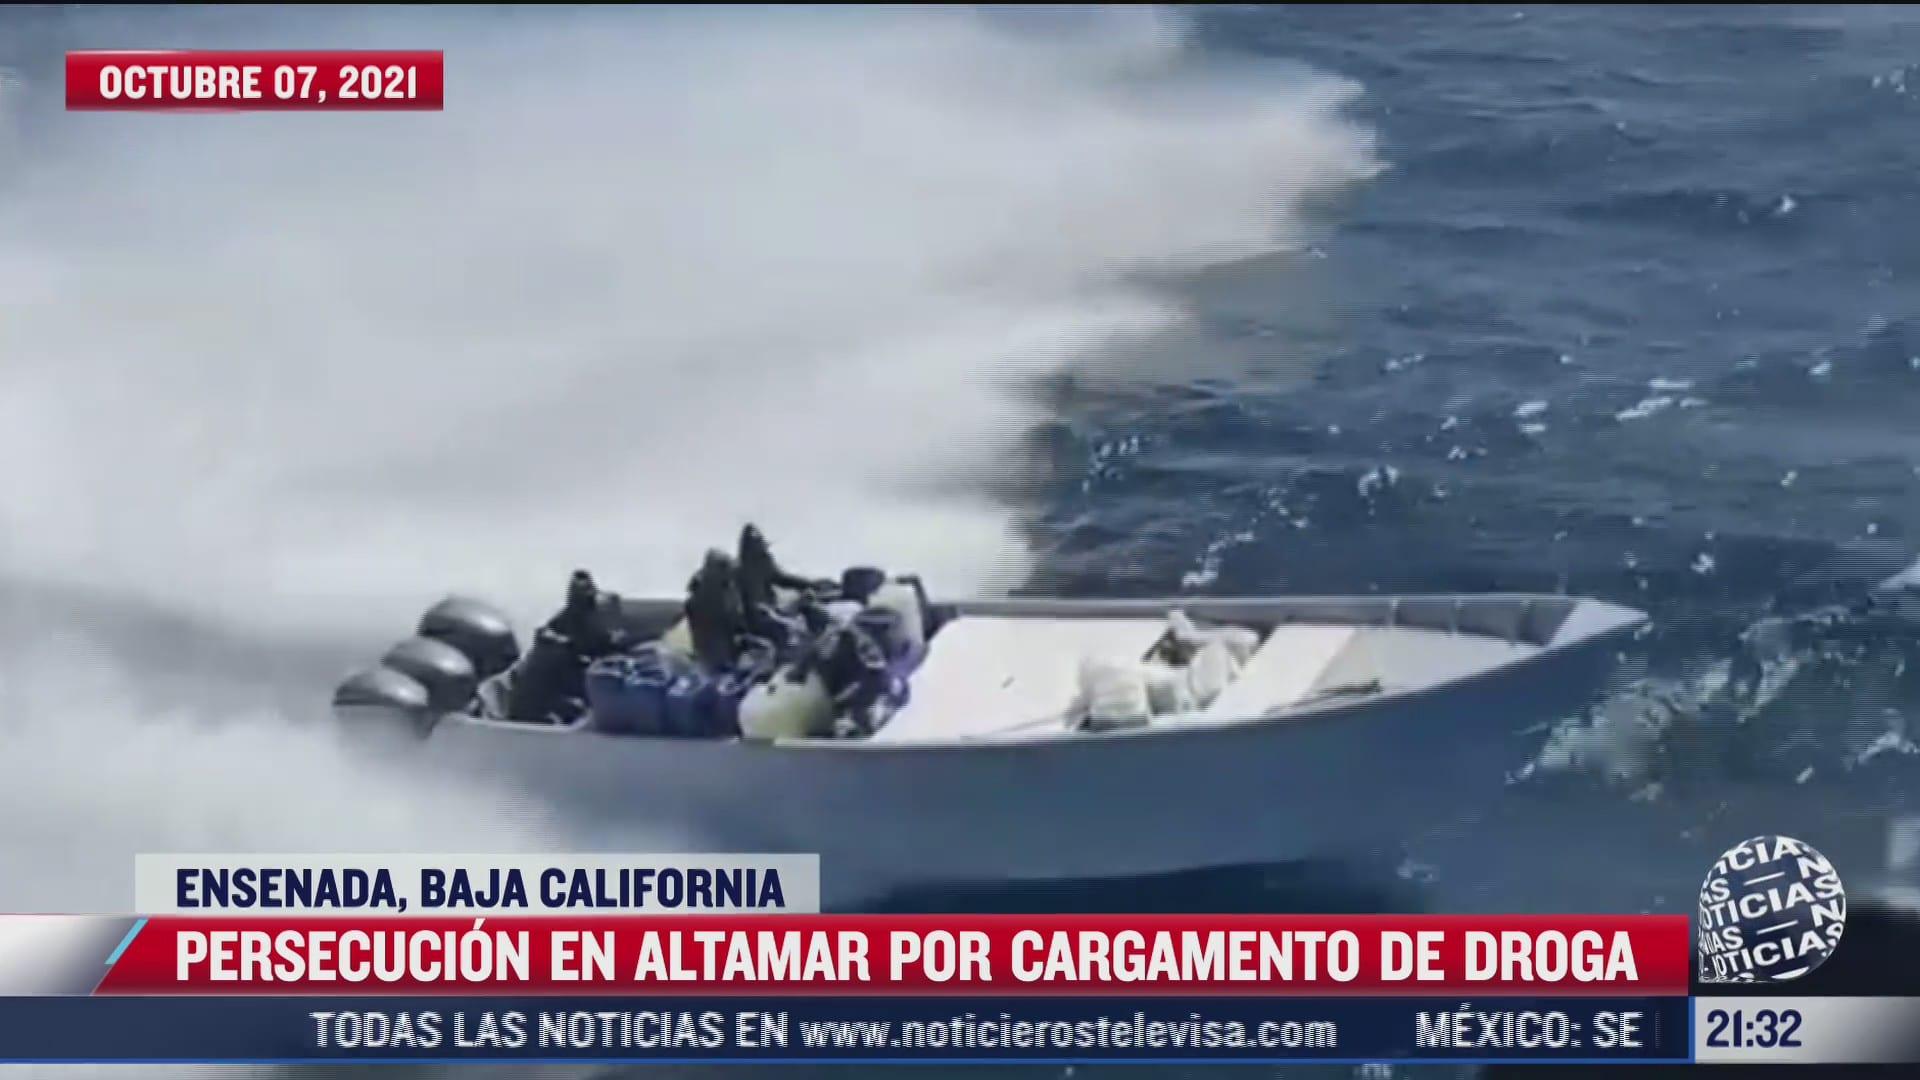 video autoridades realizan persecucion en altamar por cargamento de droga